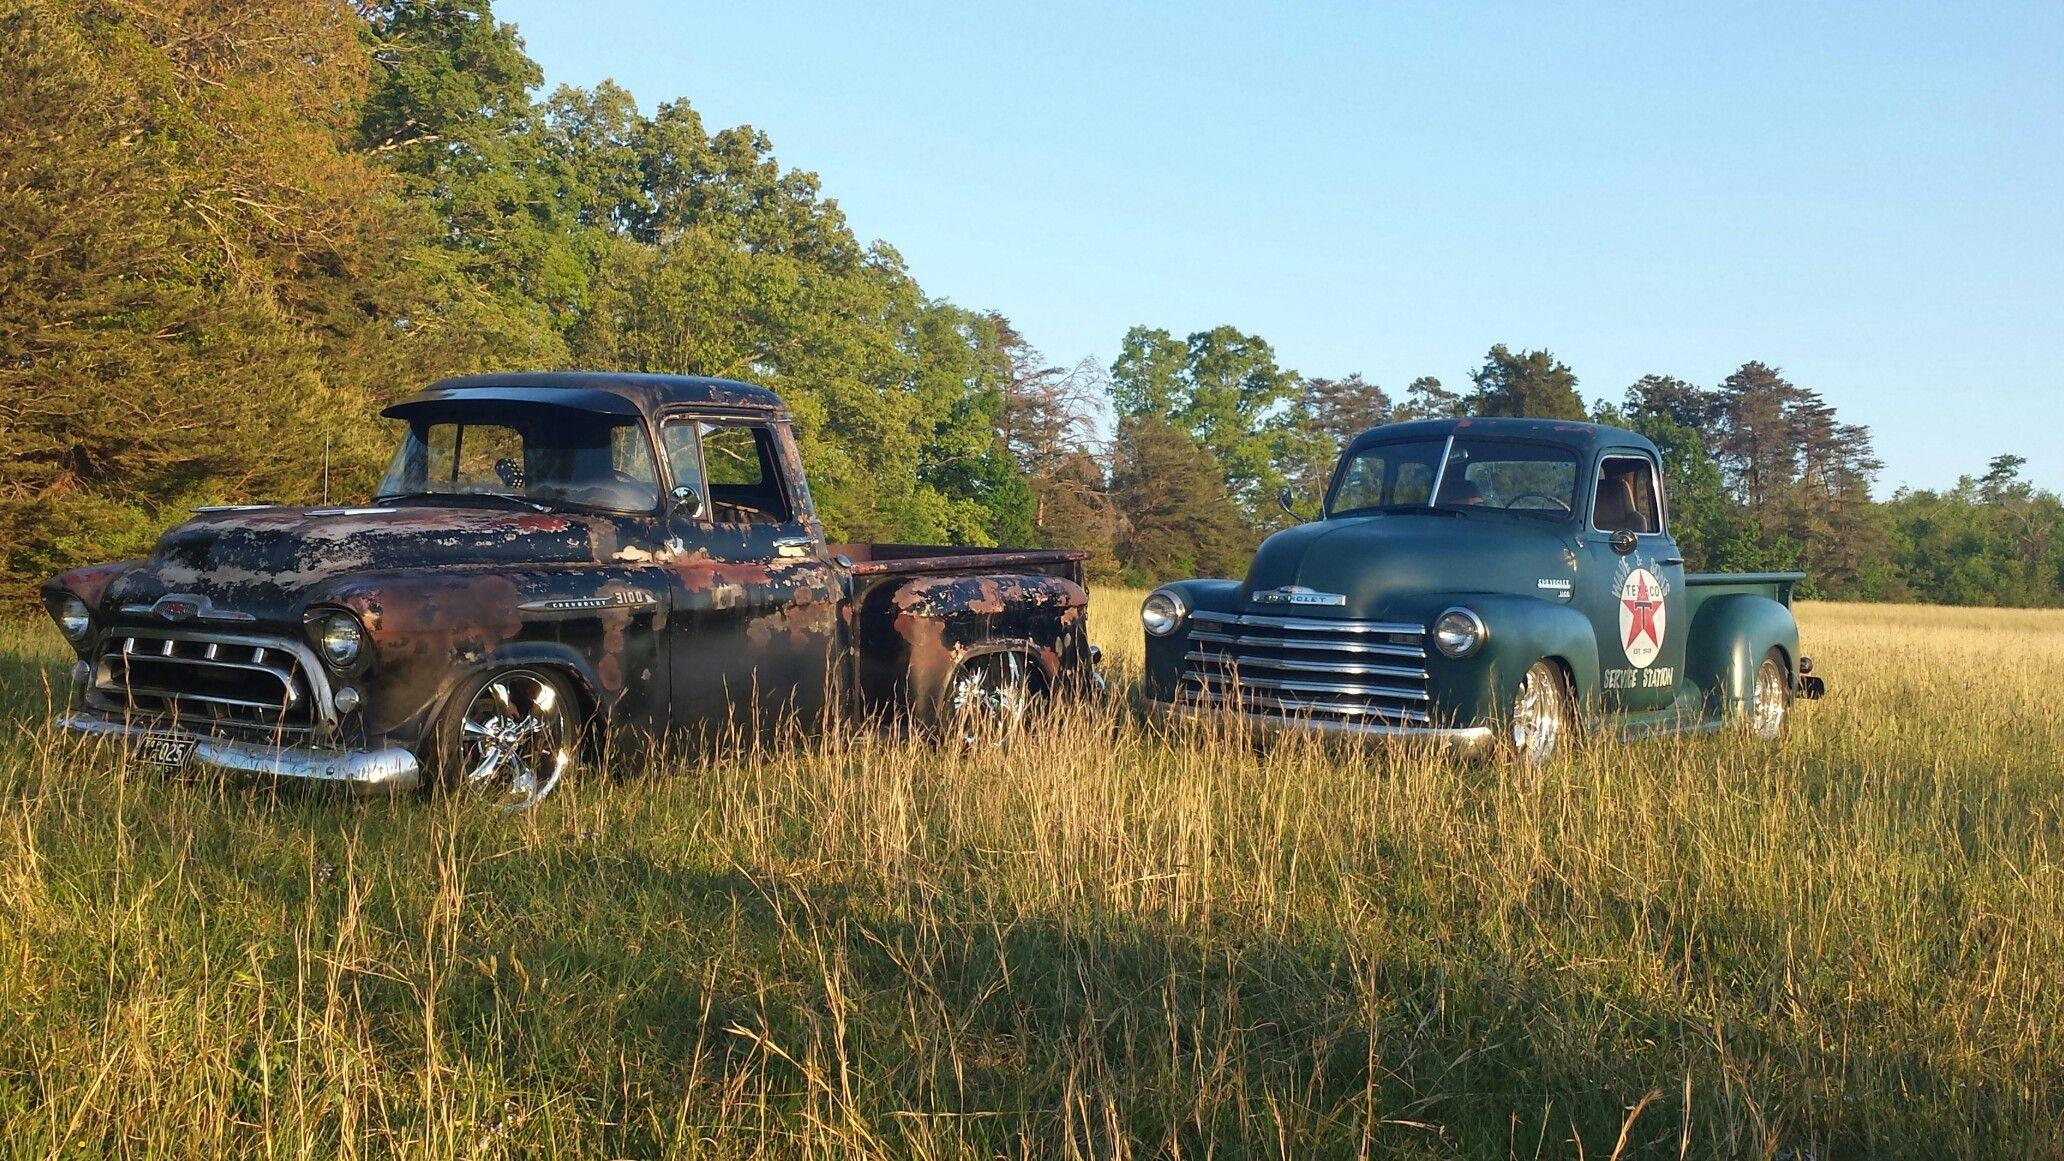 57 Chevy 49 Trucks Texaco Feild Rat Rod Low Rider 1949 Truck Hot